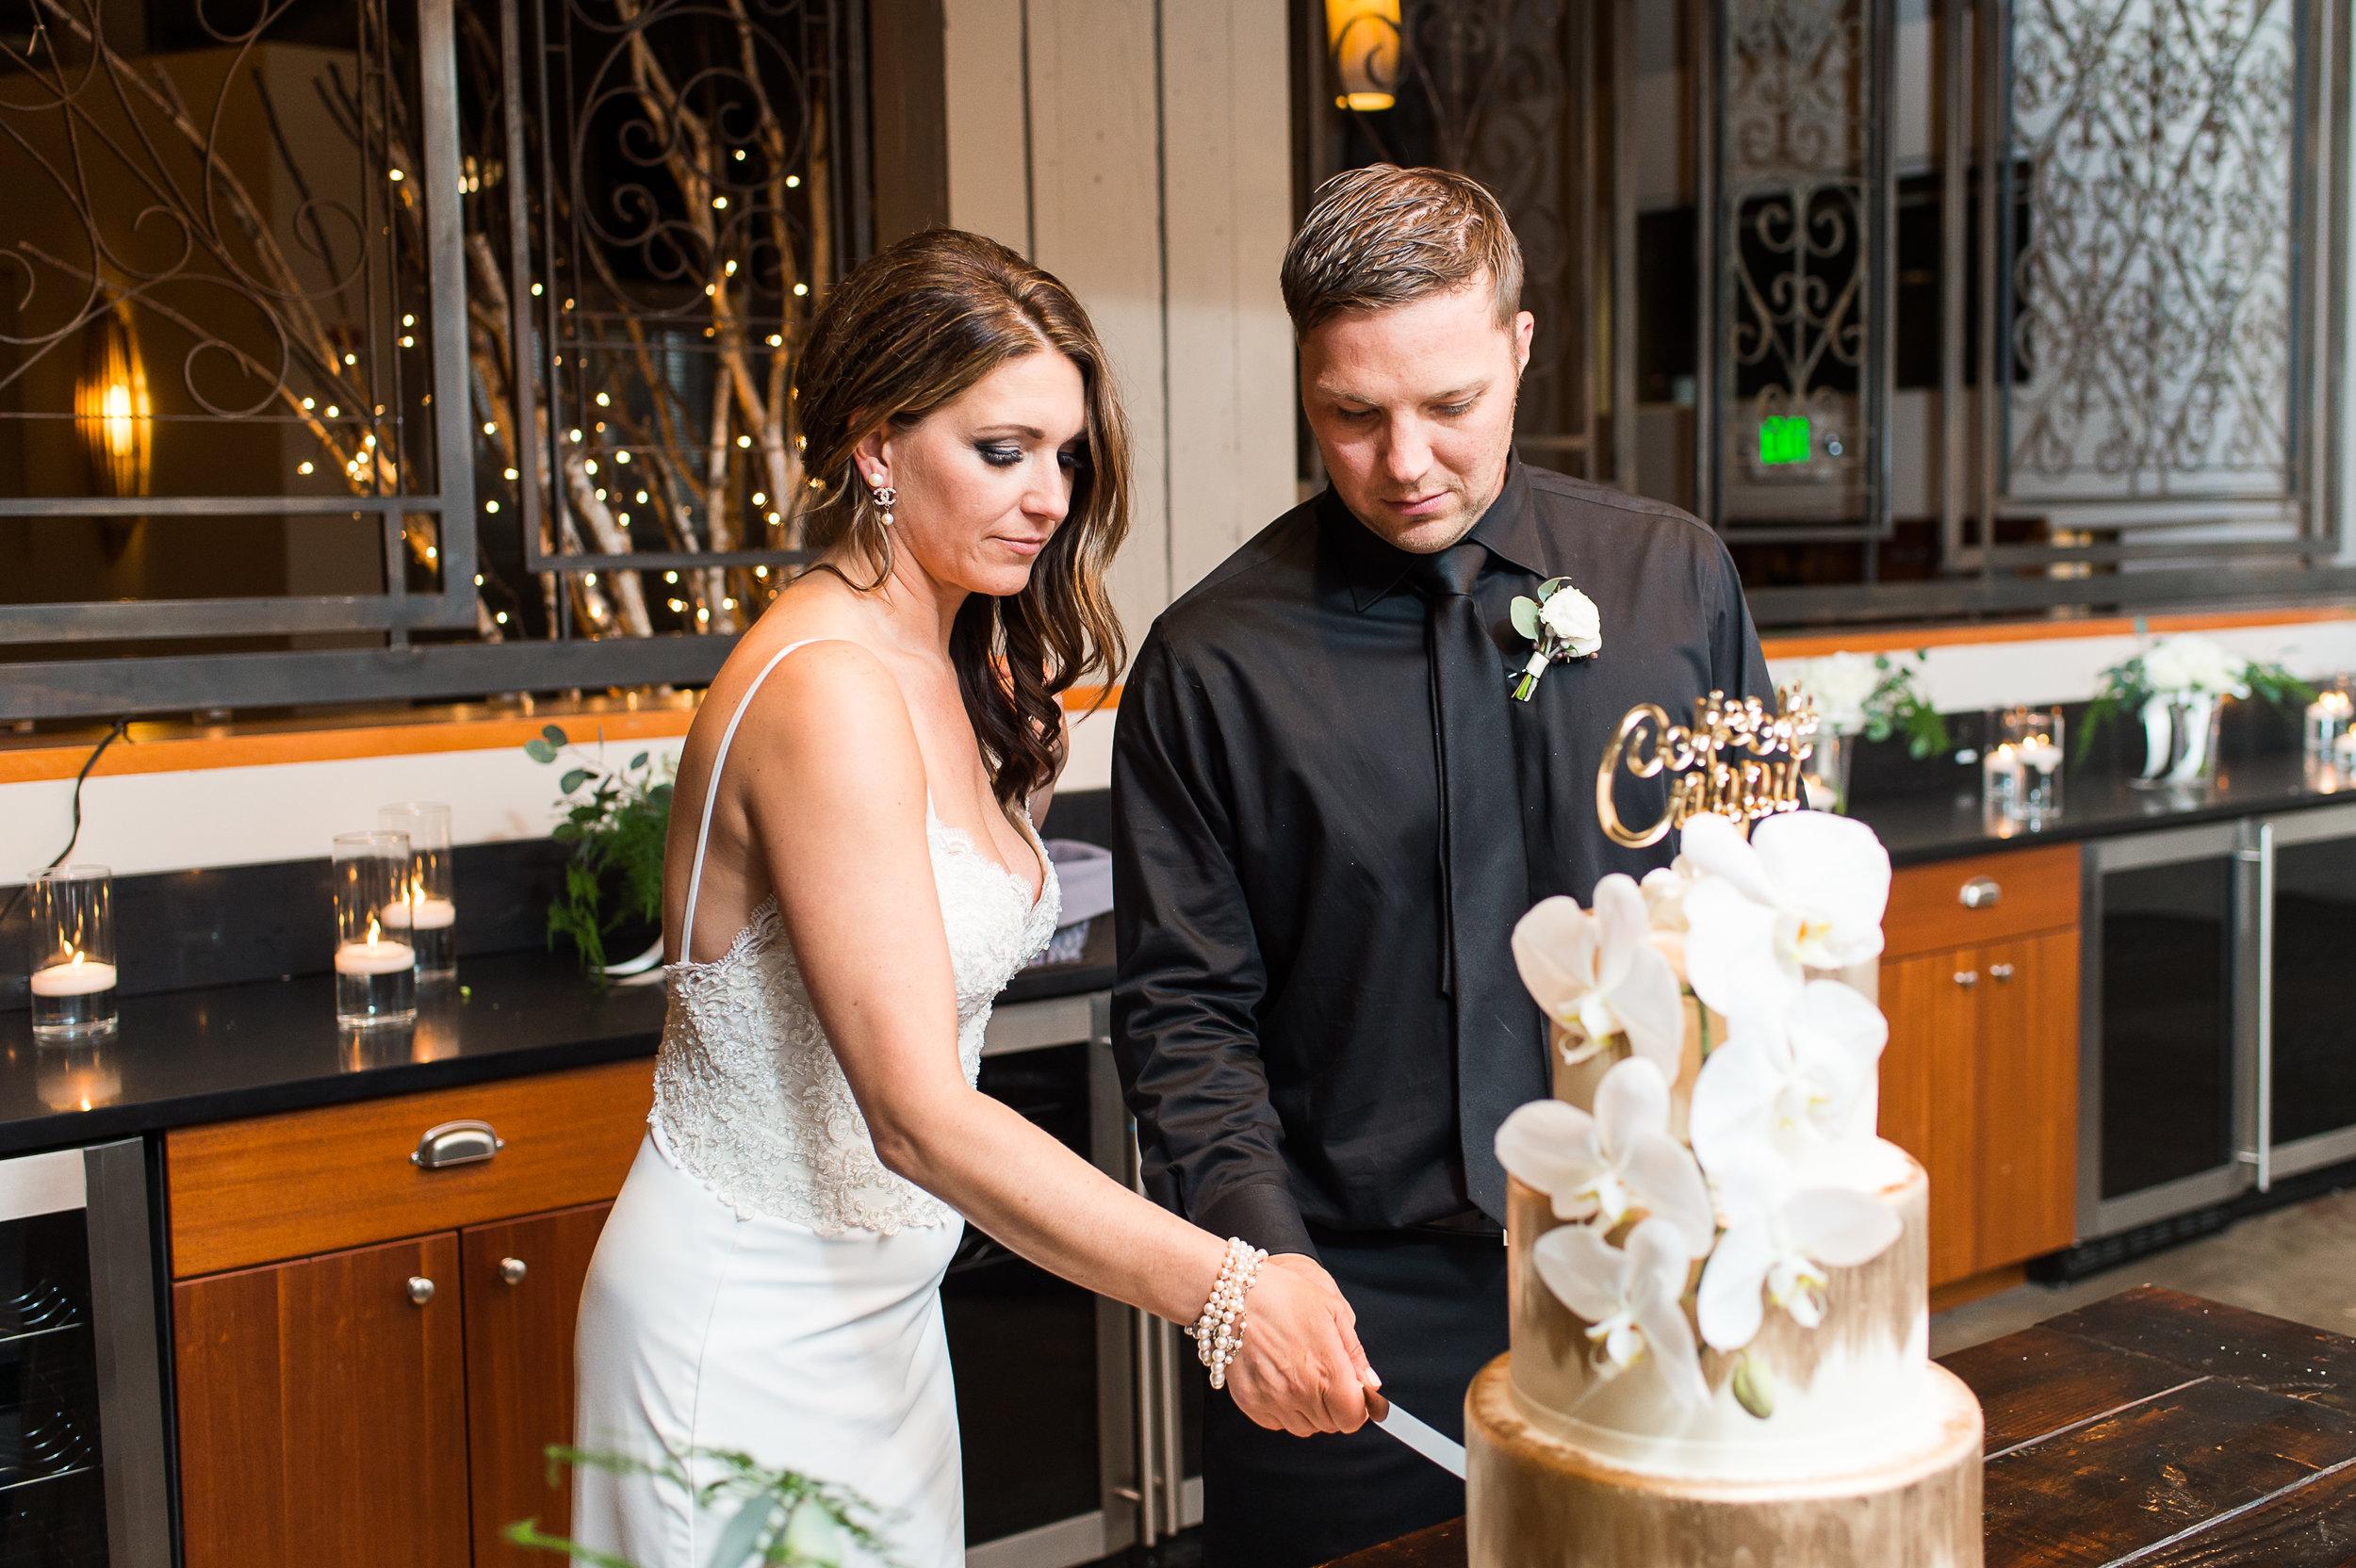 JJ-wedding-Van-Wyhe-Photography-543.jpg